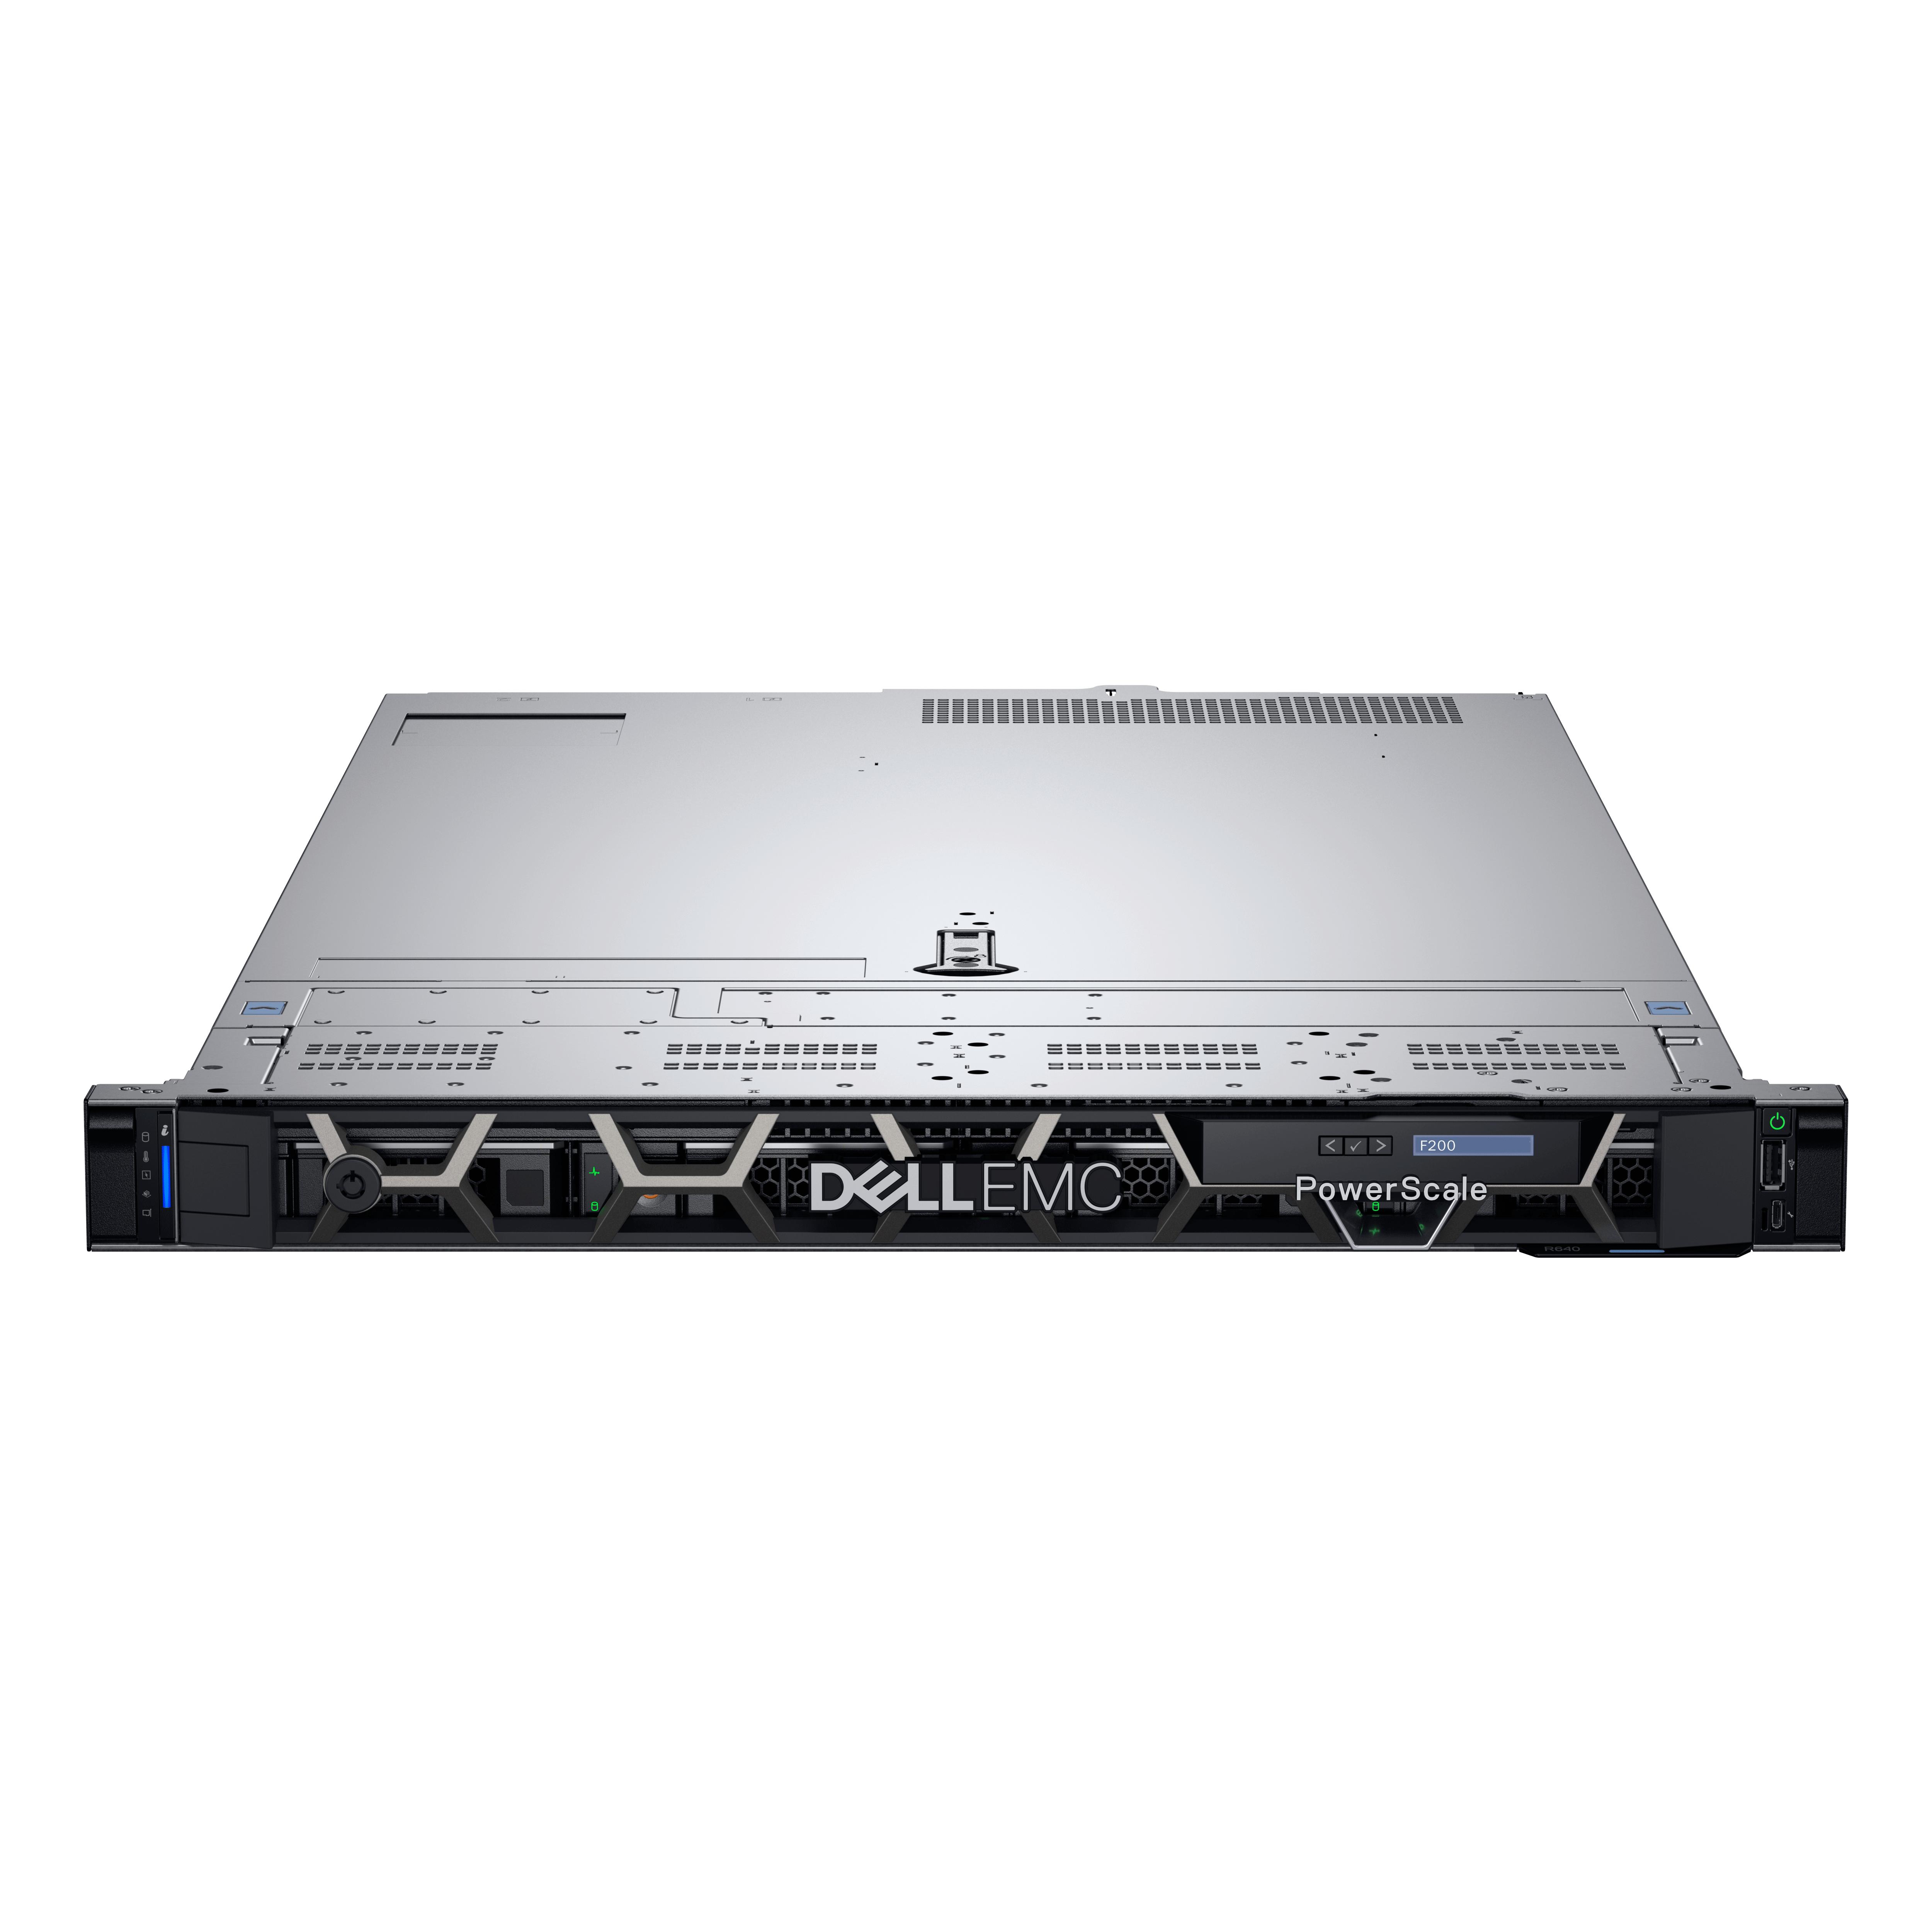 Dell EMC PowerScale F200 全闪存 NAS 节点